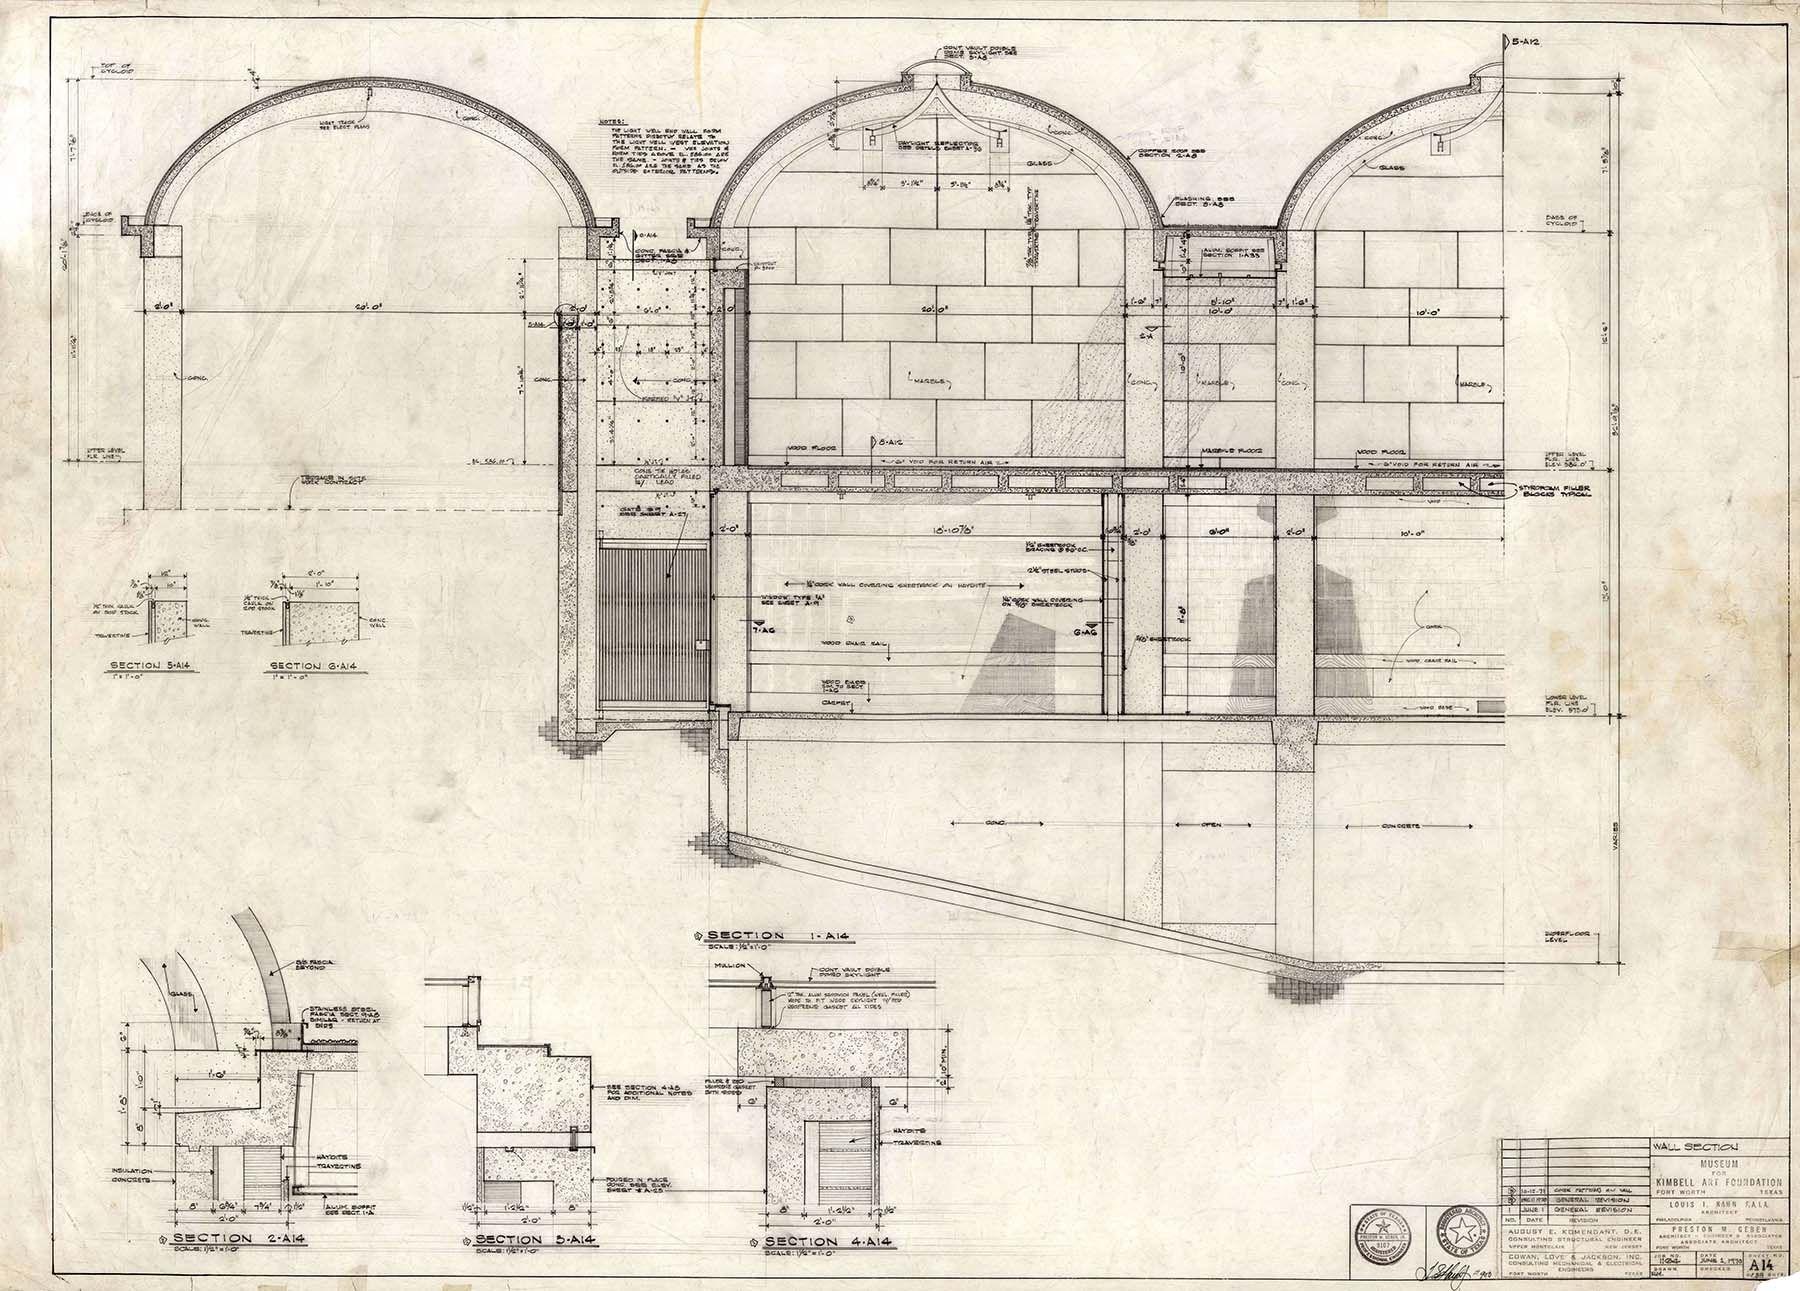 Afficher l 39 image d 39 origine r11 dessins pinterest for Origine architecture